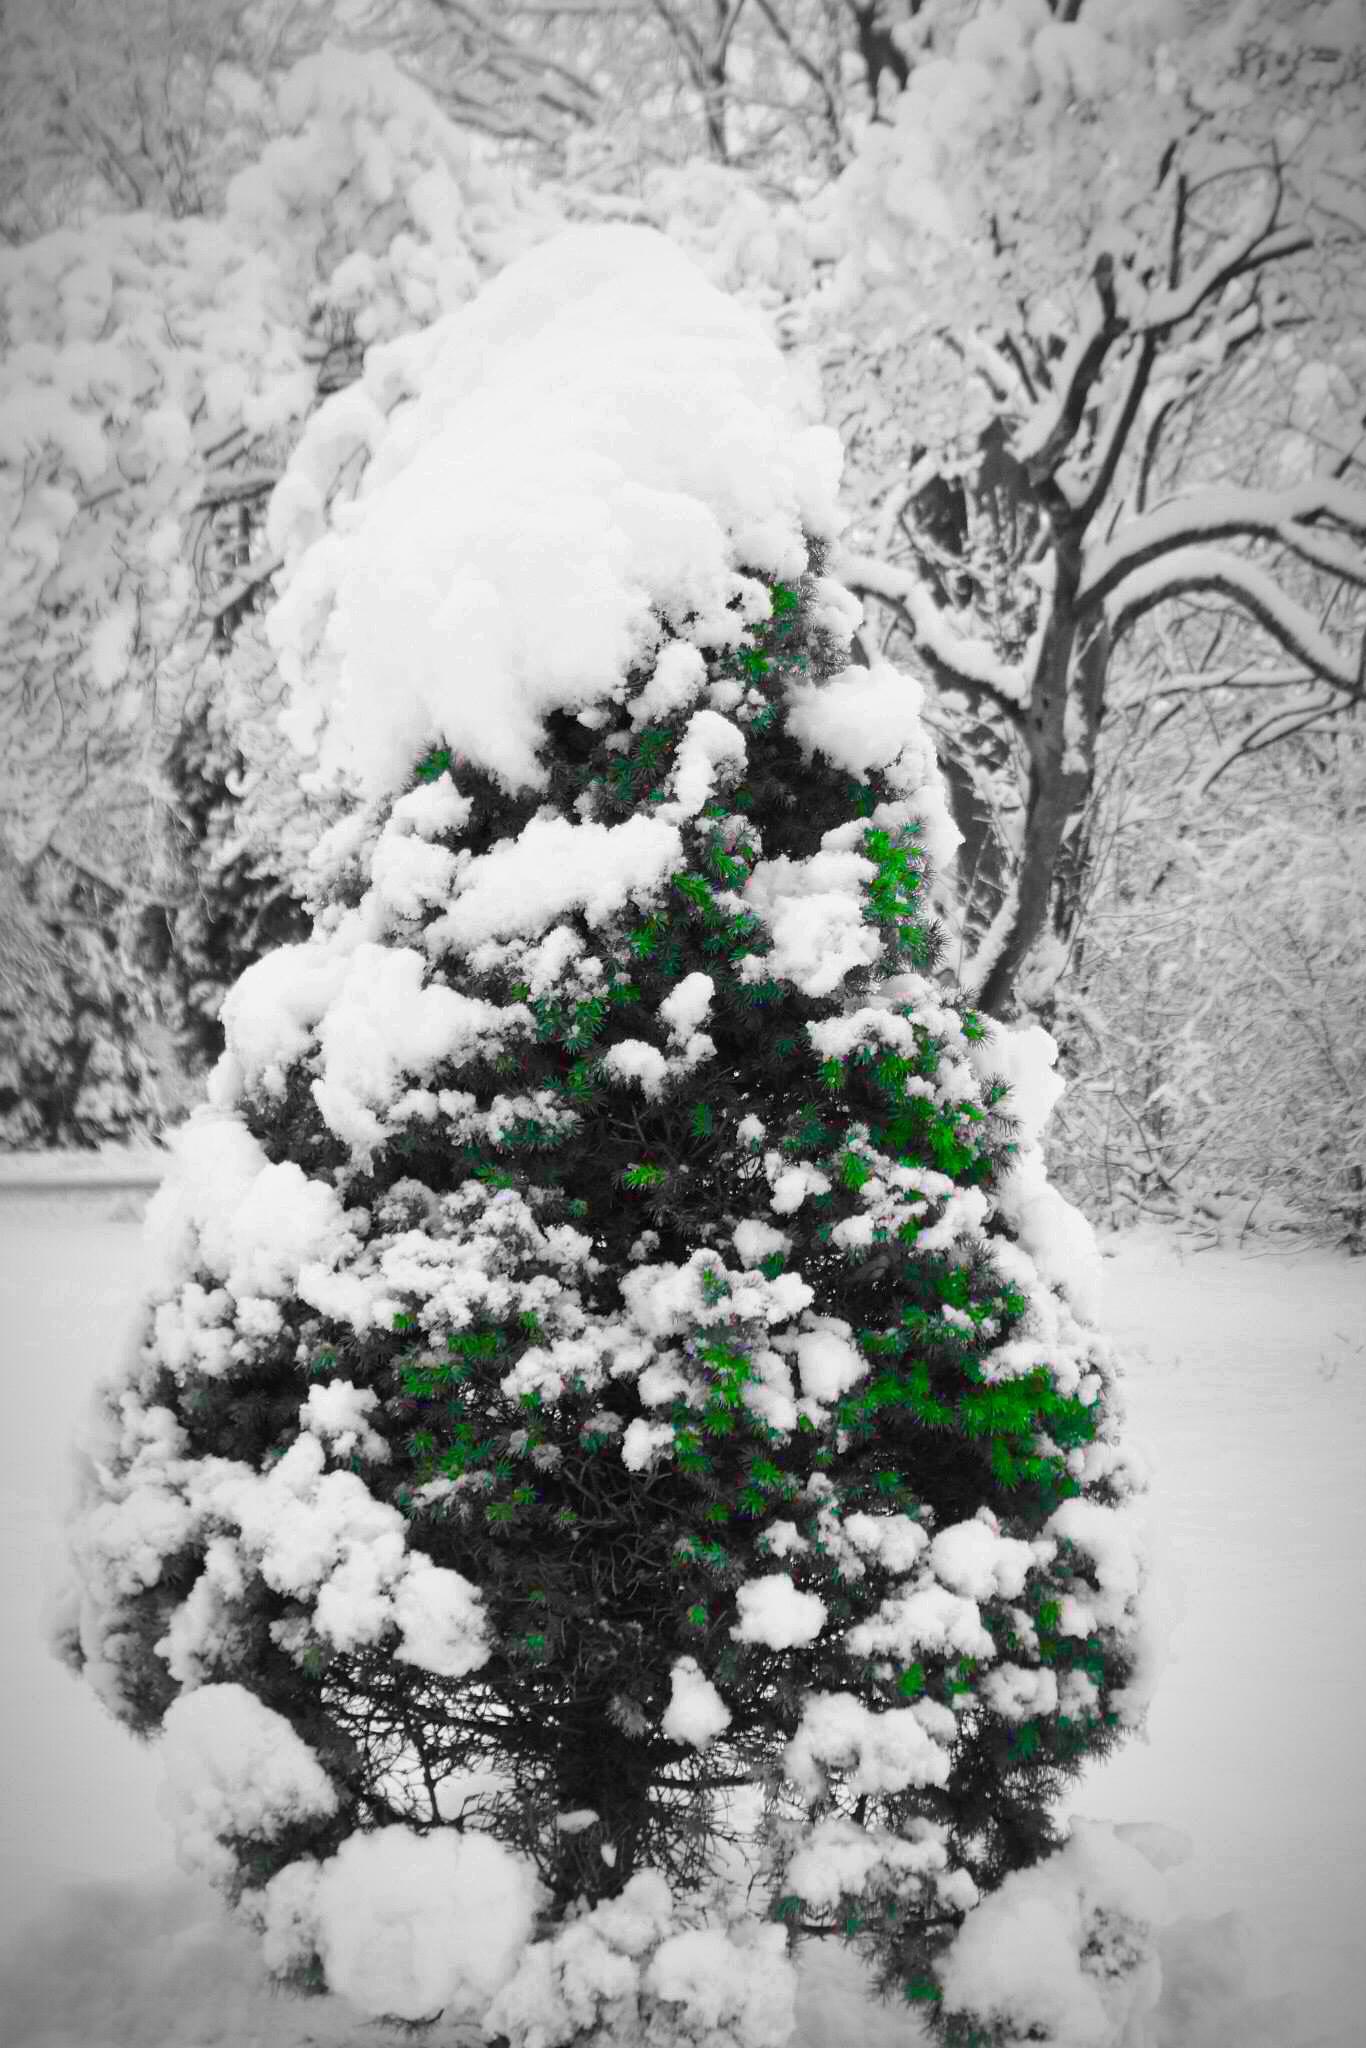 The hidden Christmas tree. by BarryBihrlePhotography